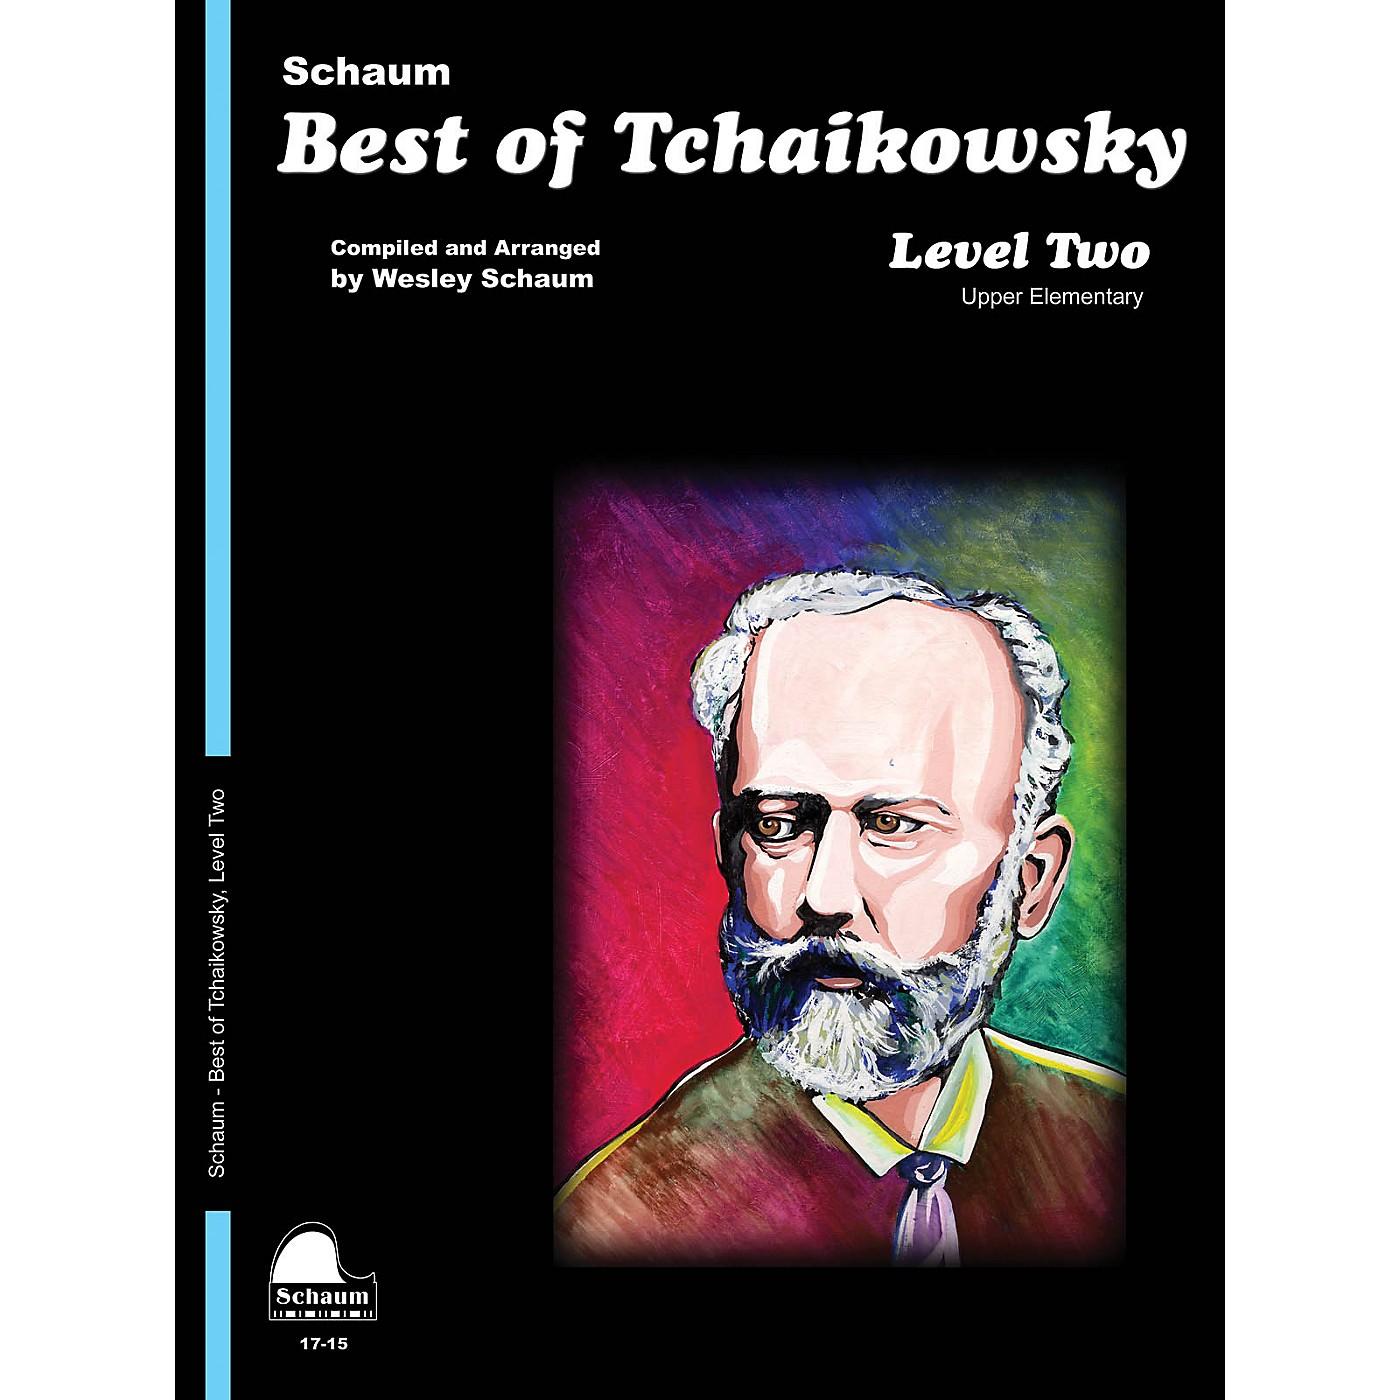 SCHAUM Best of Tchaikowsky (Level 2 Upper Elem Level) Educational Piano Book thumbnail